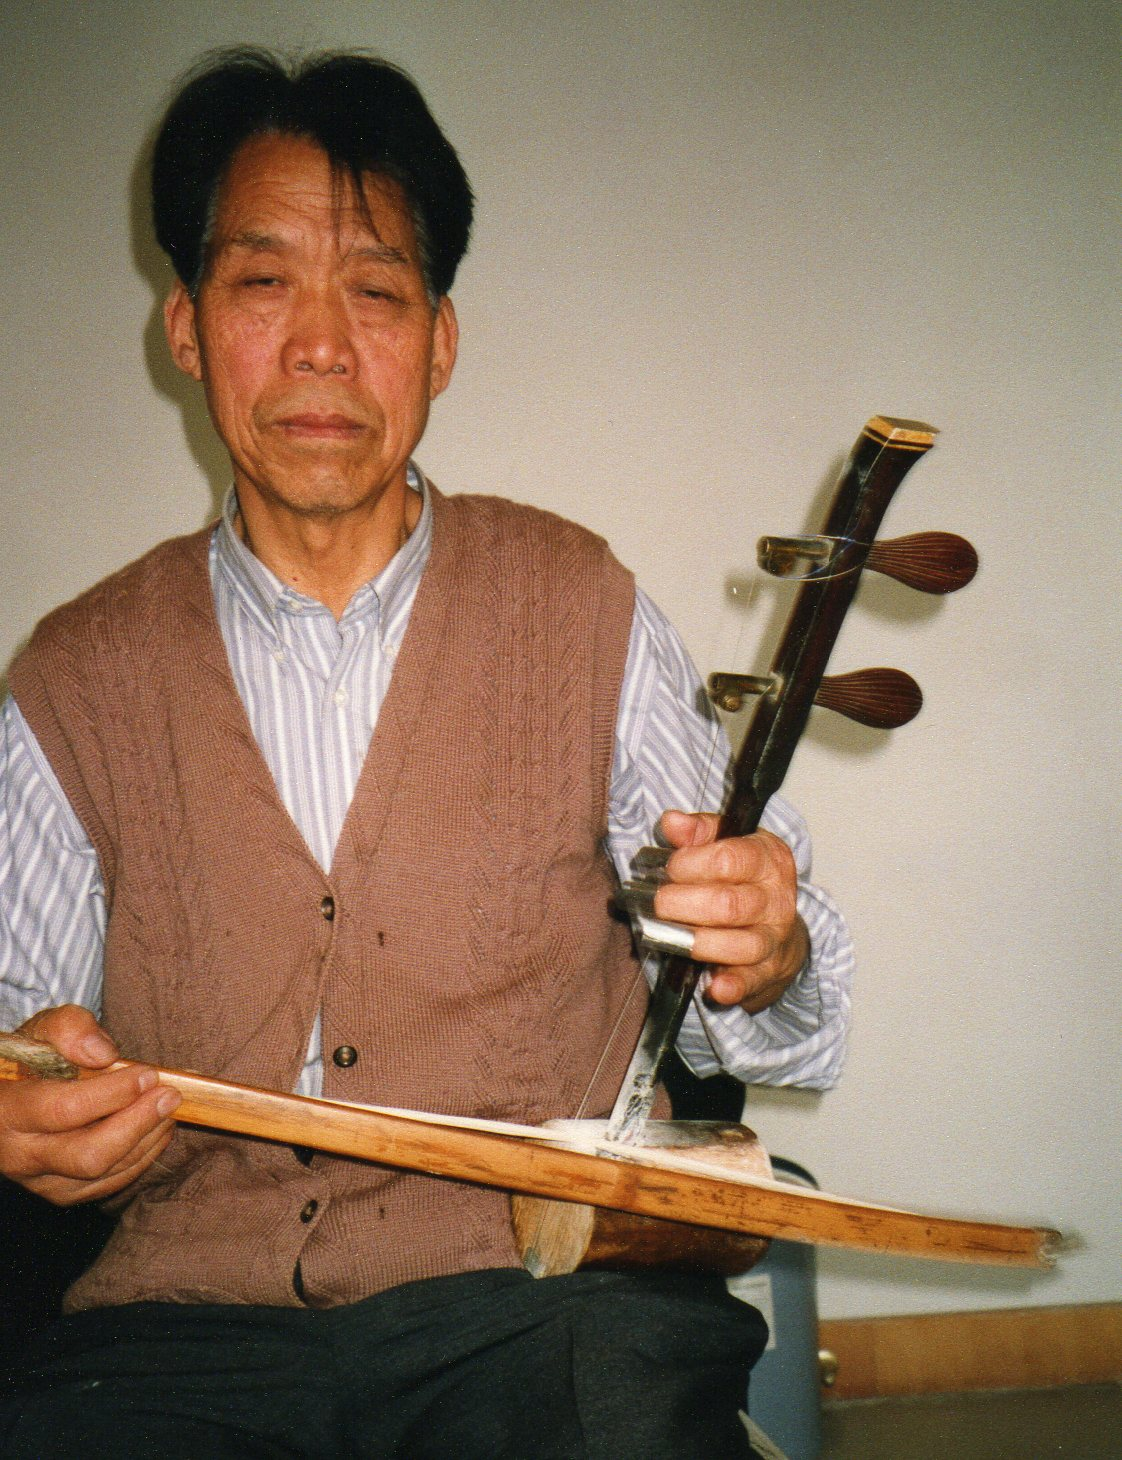 Violins Musical Instruments & Gear Ingenious Jing Hu 2 String Set Of Jinghu Strings Chinese Traditional Instrument Uk